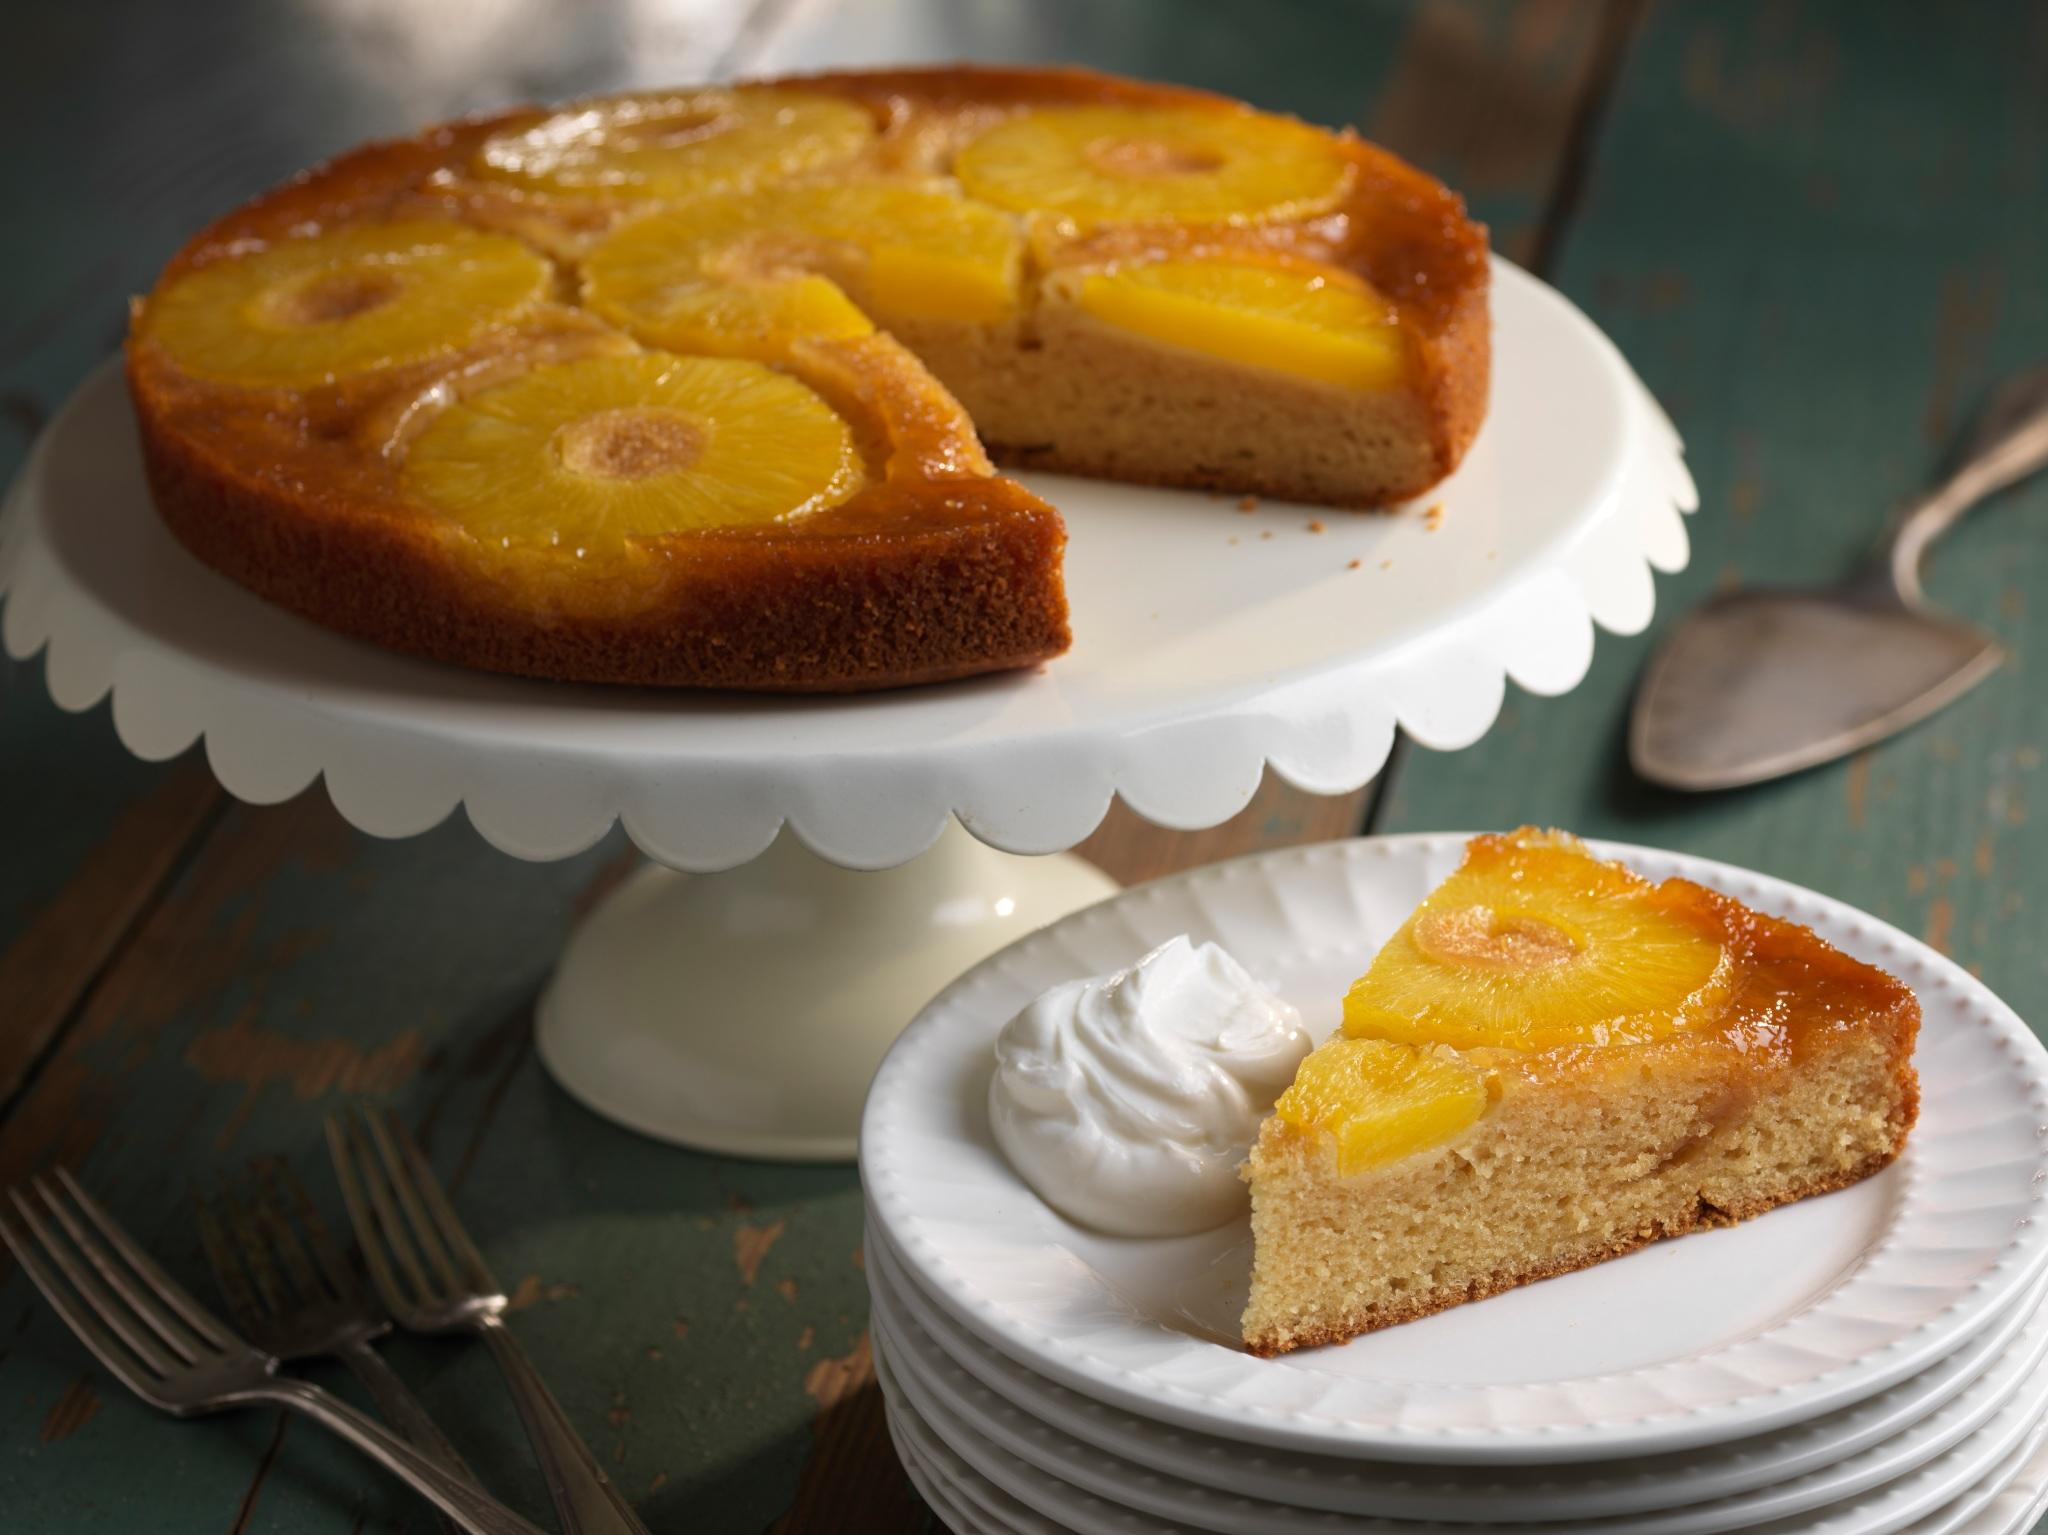 pineapple-downside-up-cake